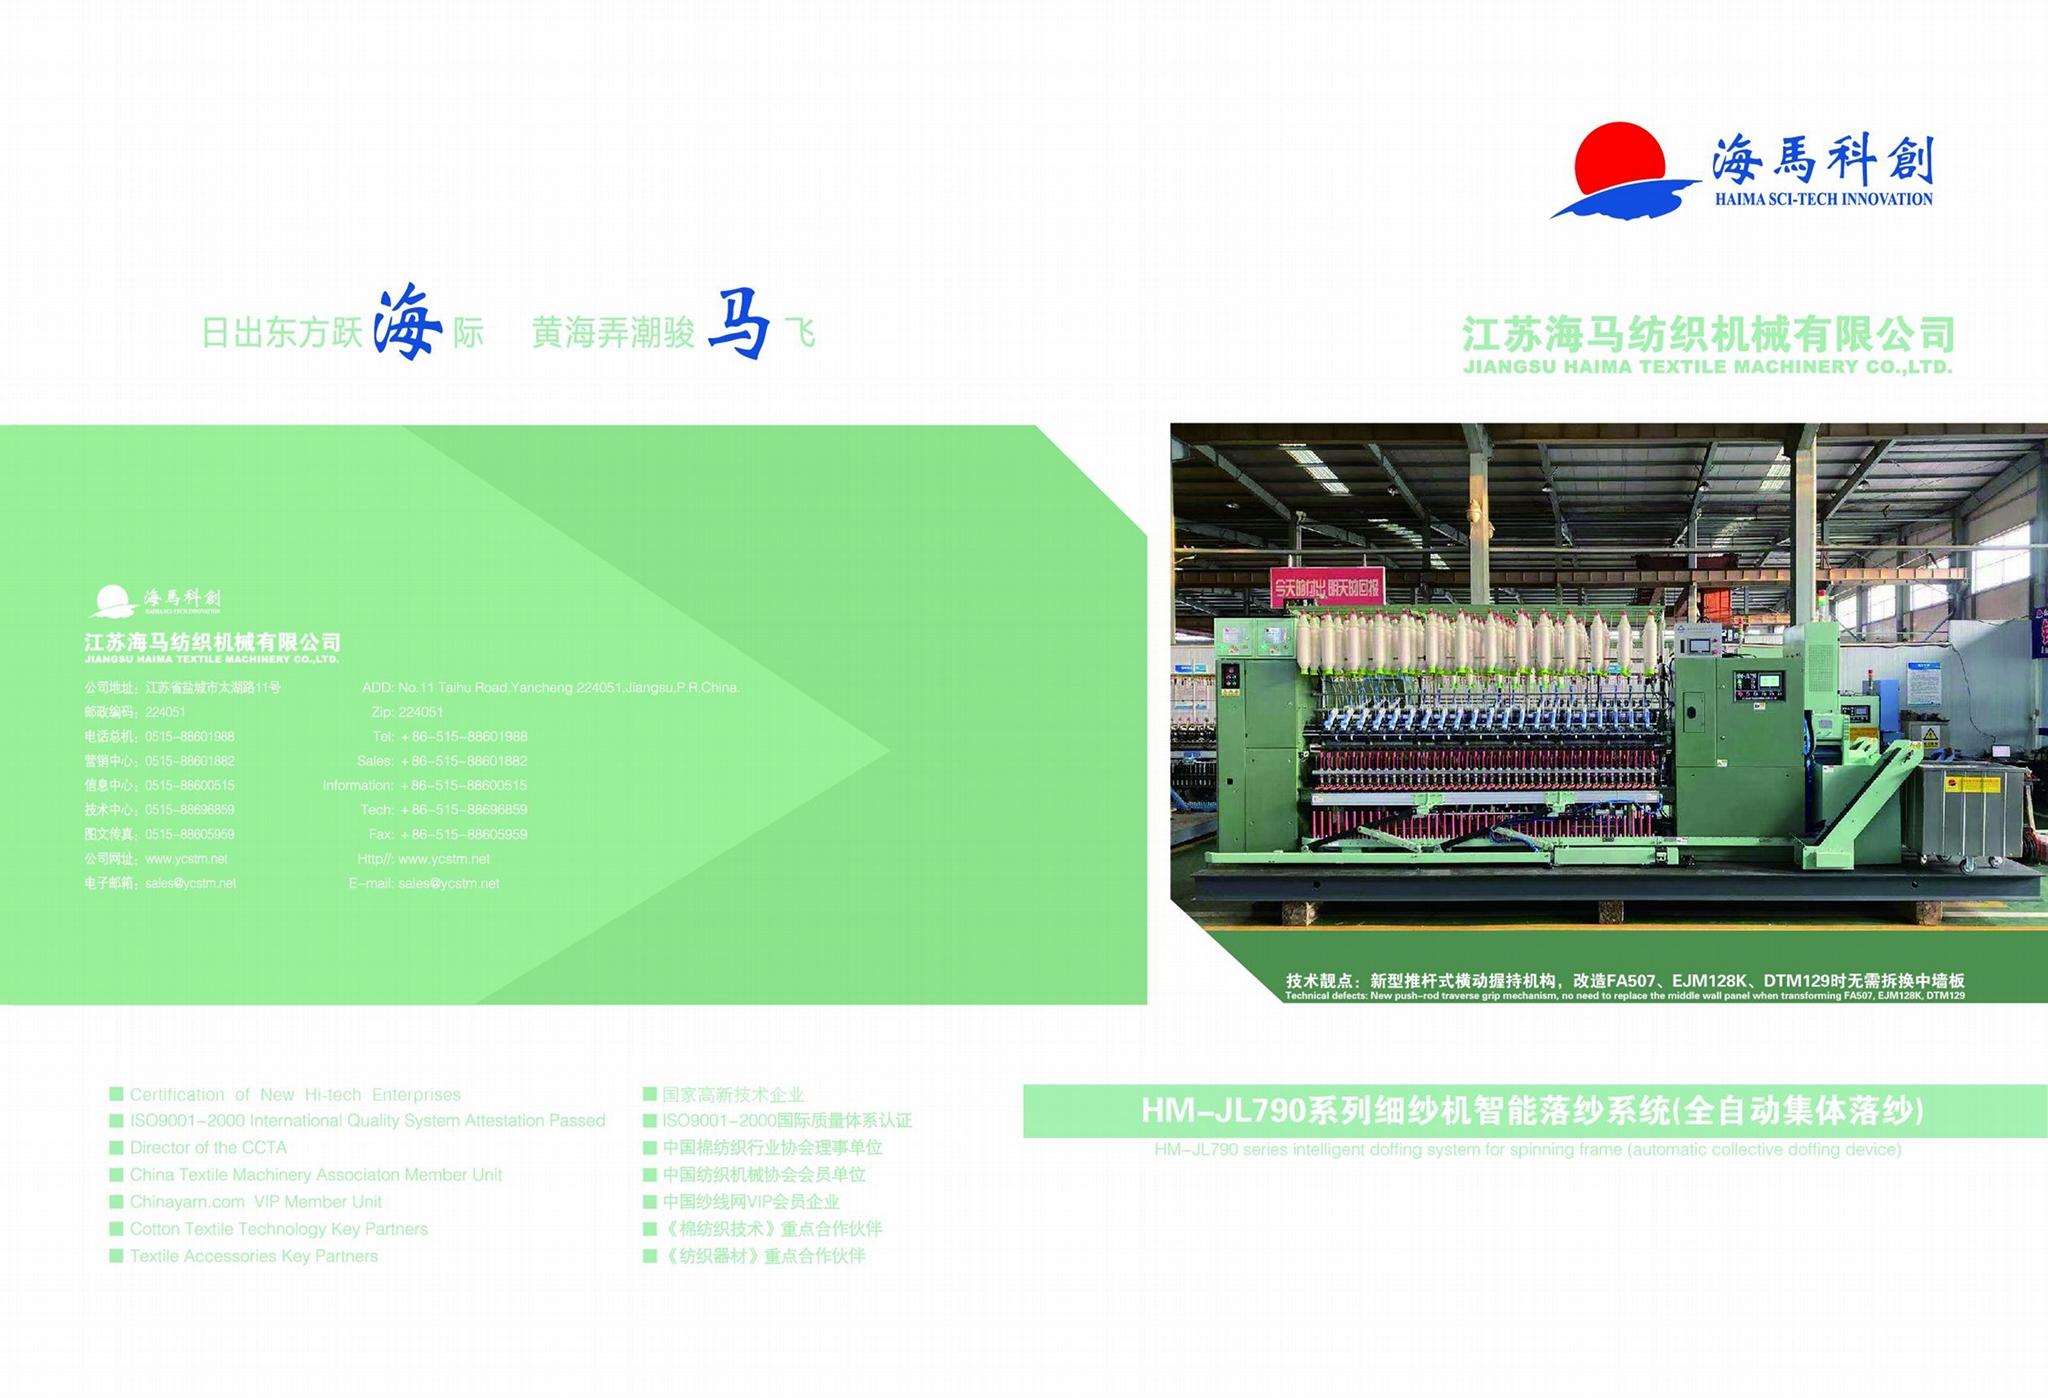 HM-JL790系列细纱机智能落纱系统 1